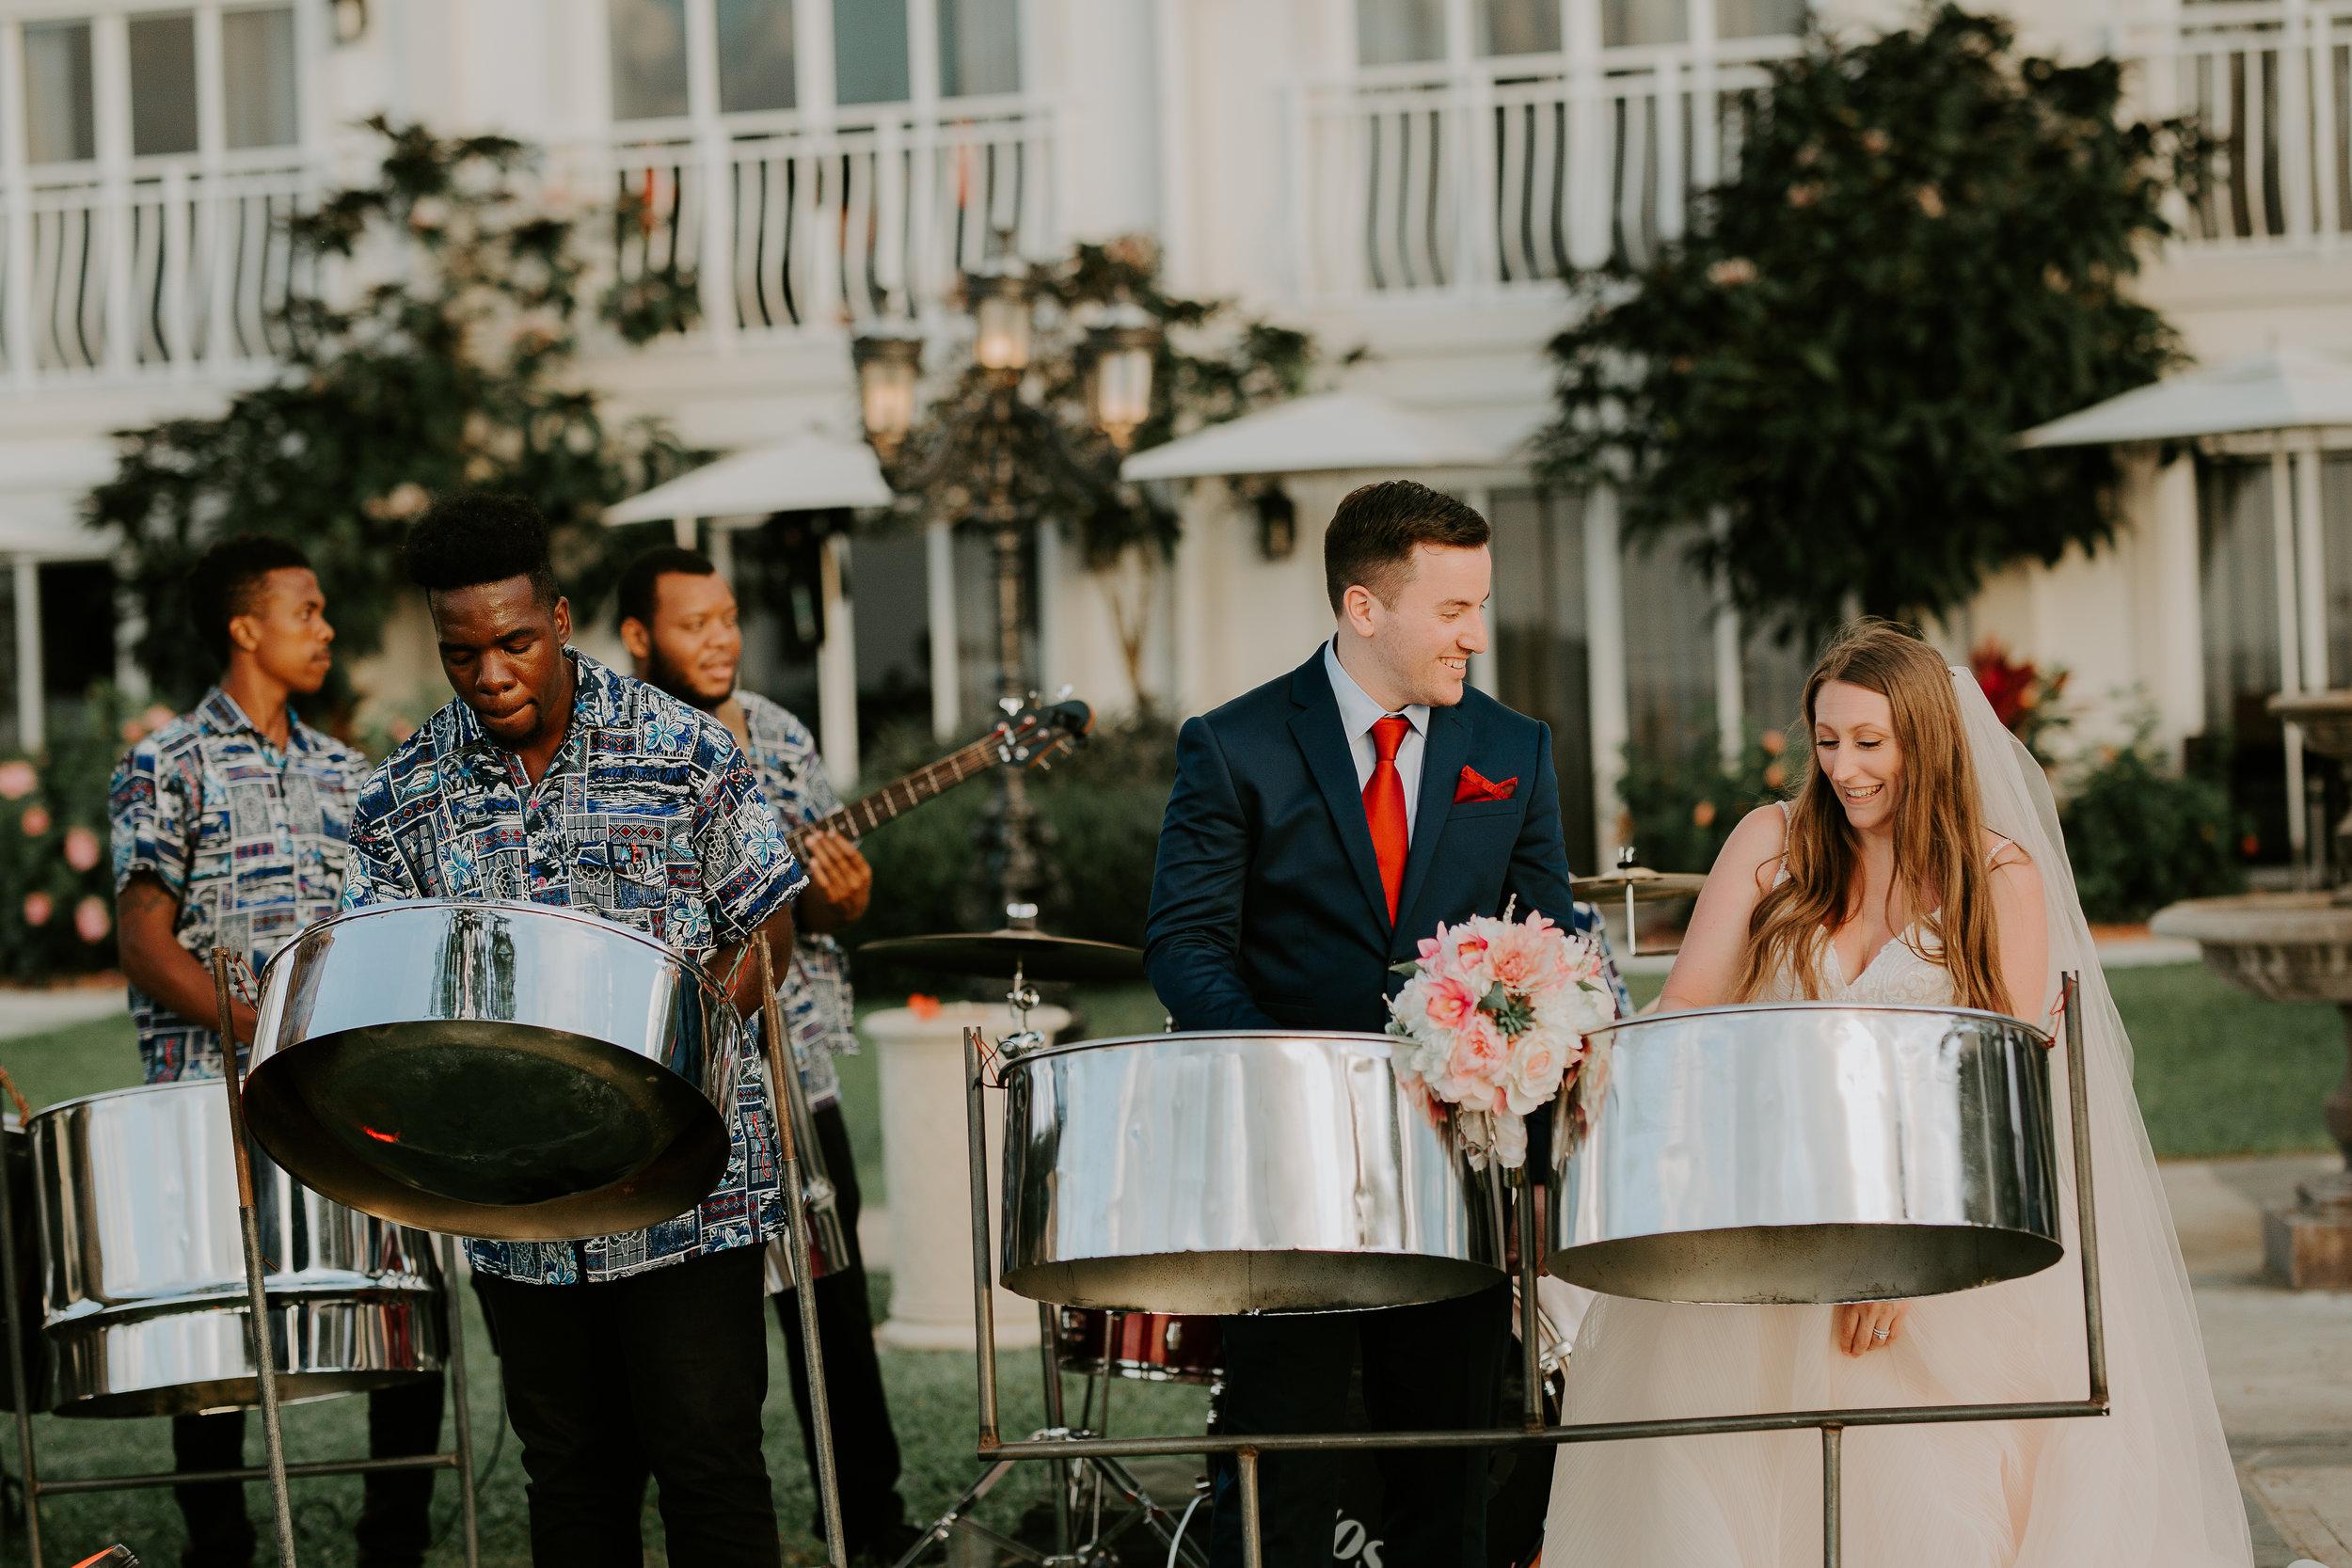 nicole-daacke-photography-destination-wedding-in-st-lucia-sandals-la-toc-intimate-island-wedding-carribean-elopement-photographer-chill-island-wedding-113.jpg